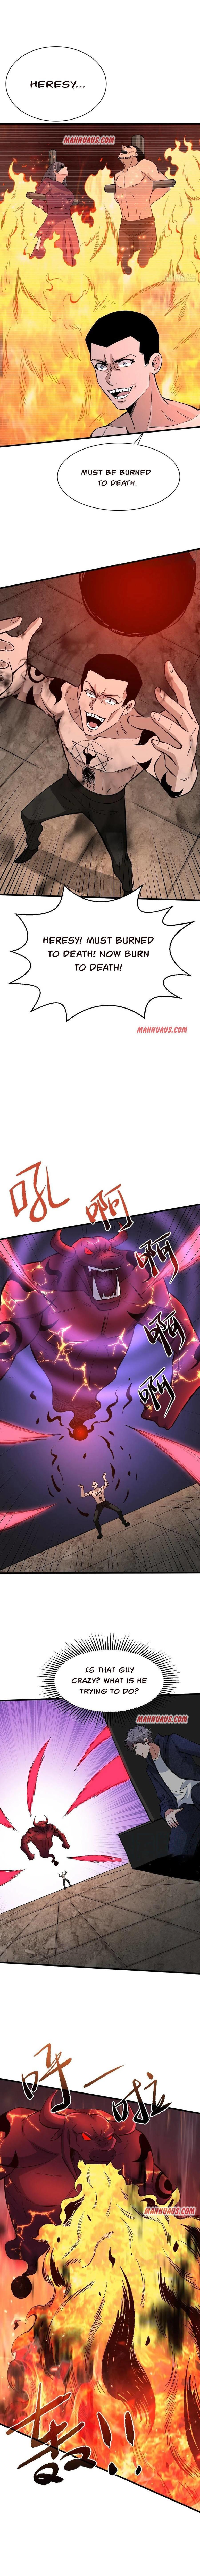 Back To Rule Again Chapter 141 page 3 - Mangakakalots.com